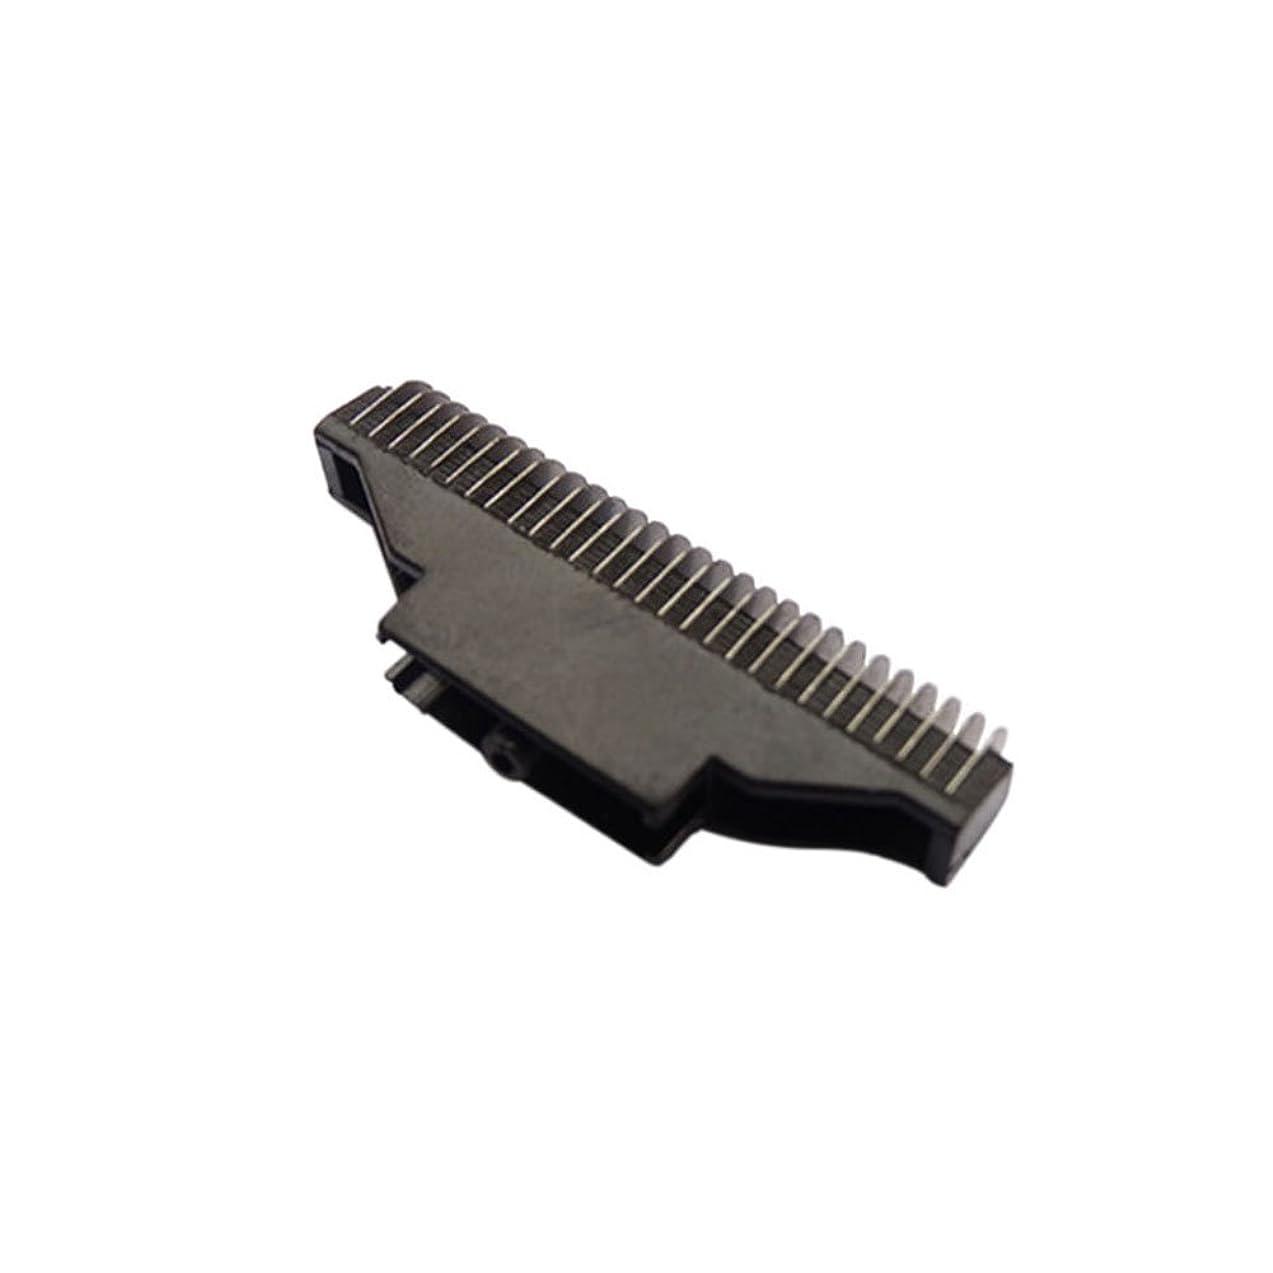 HZjundasi Replacement Inner ブレード コンボ for Panasonic ES4823/4001/4853 ES9852